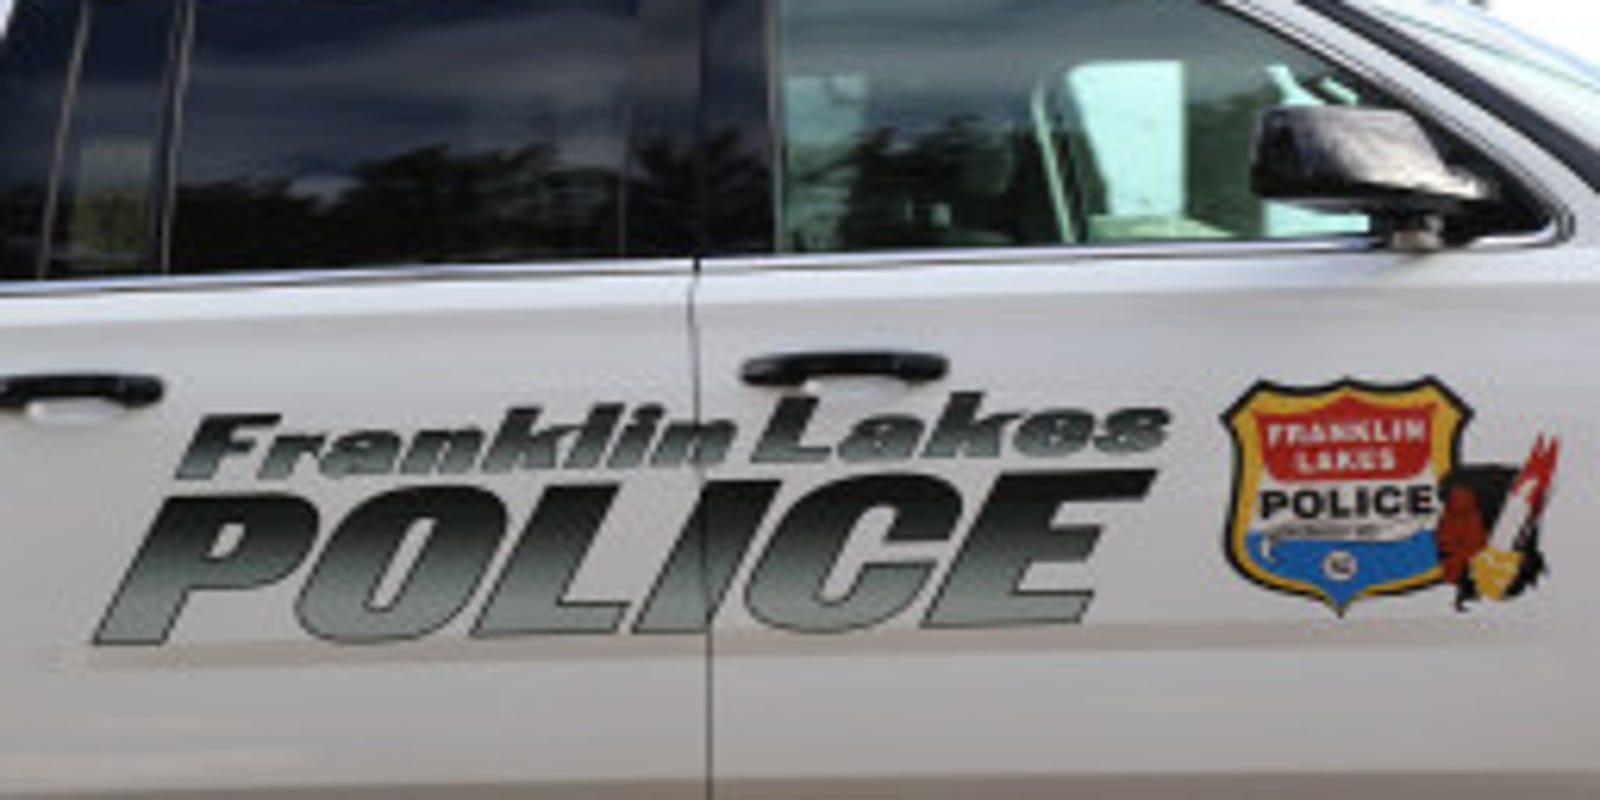 Officer injured pursuing stolen car in Franklin Lakes